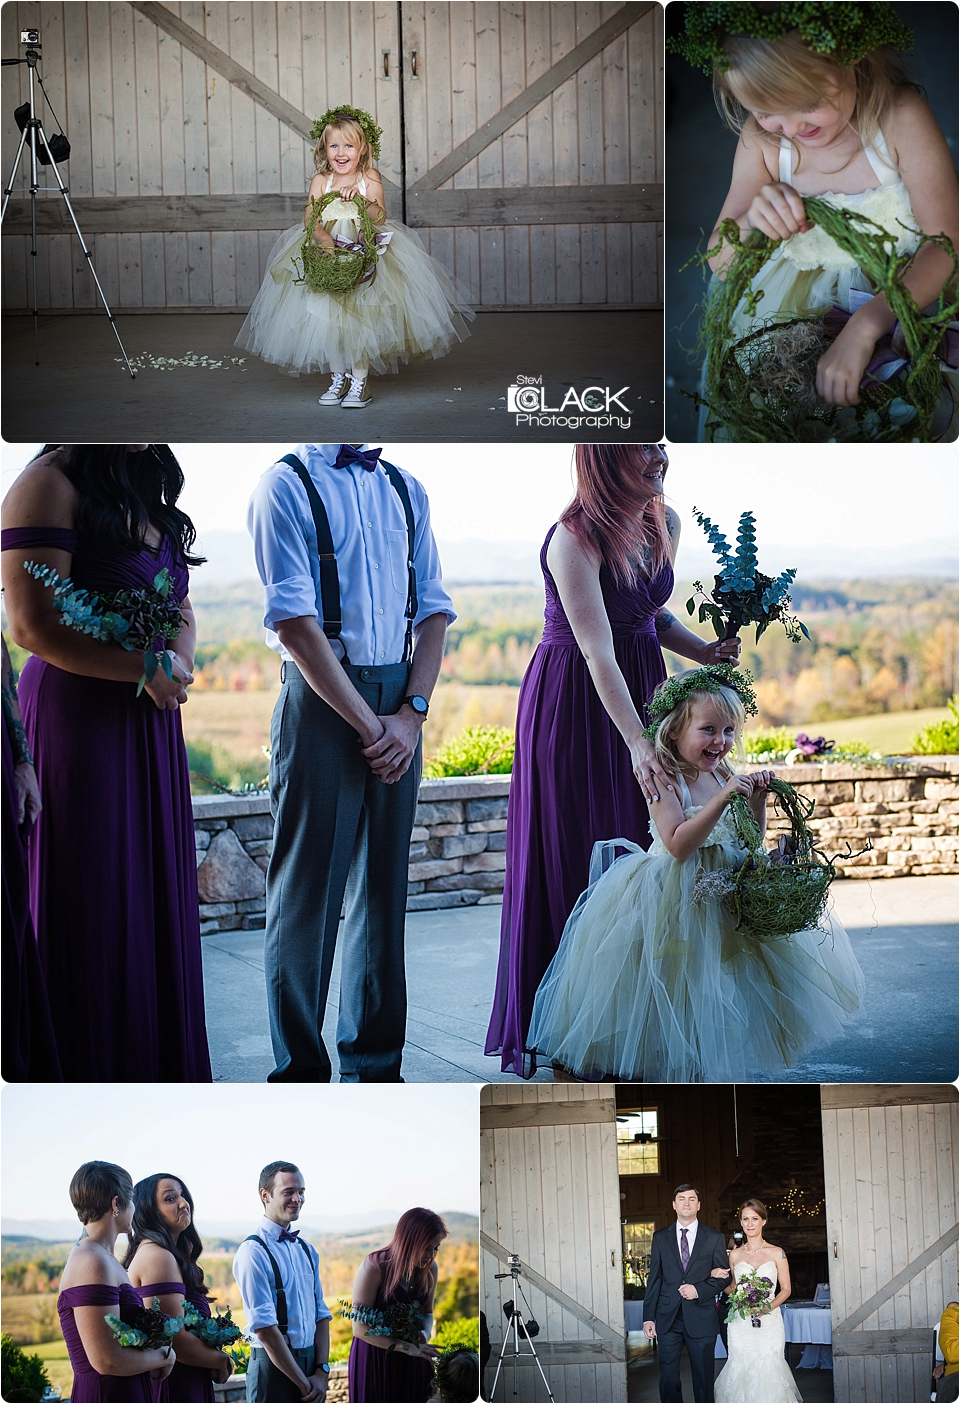 Atlanta wedding Photographer Stevi clack Photography_2353.jpg